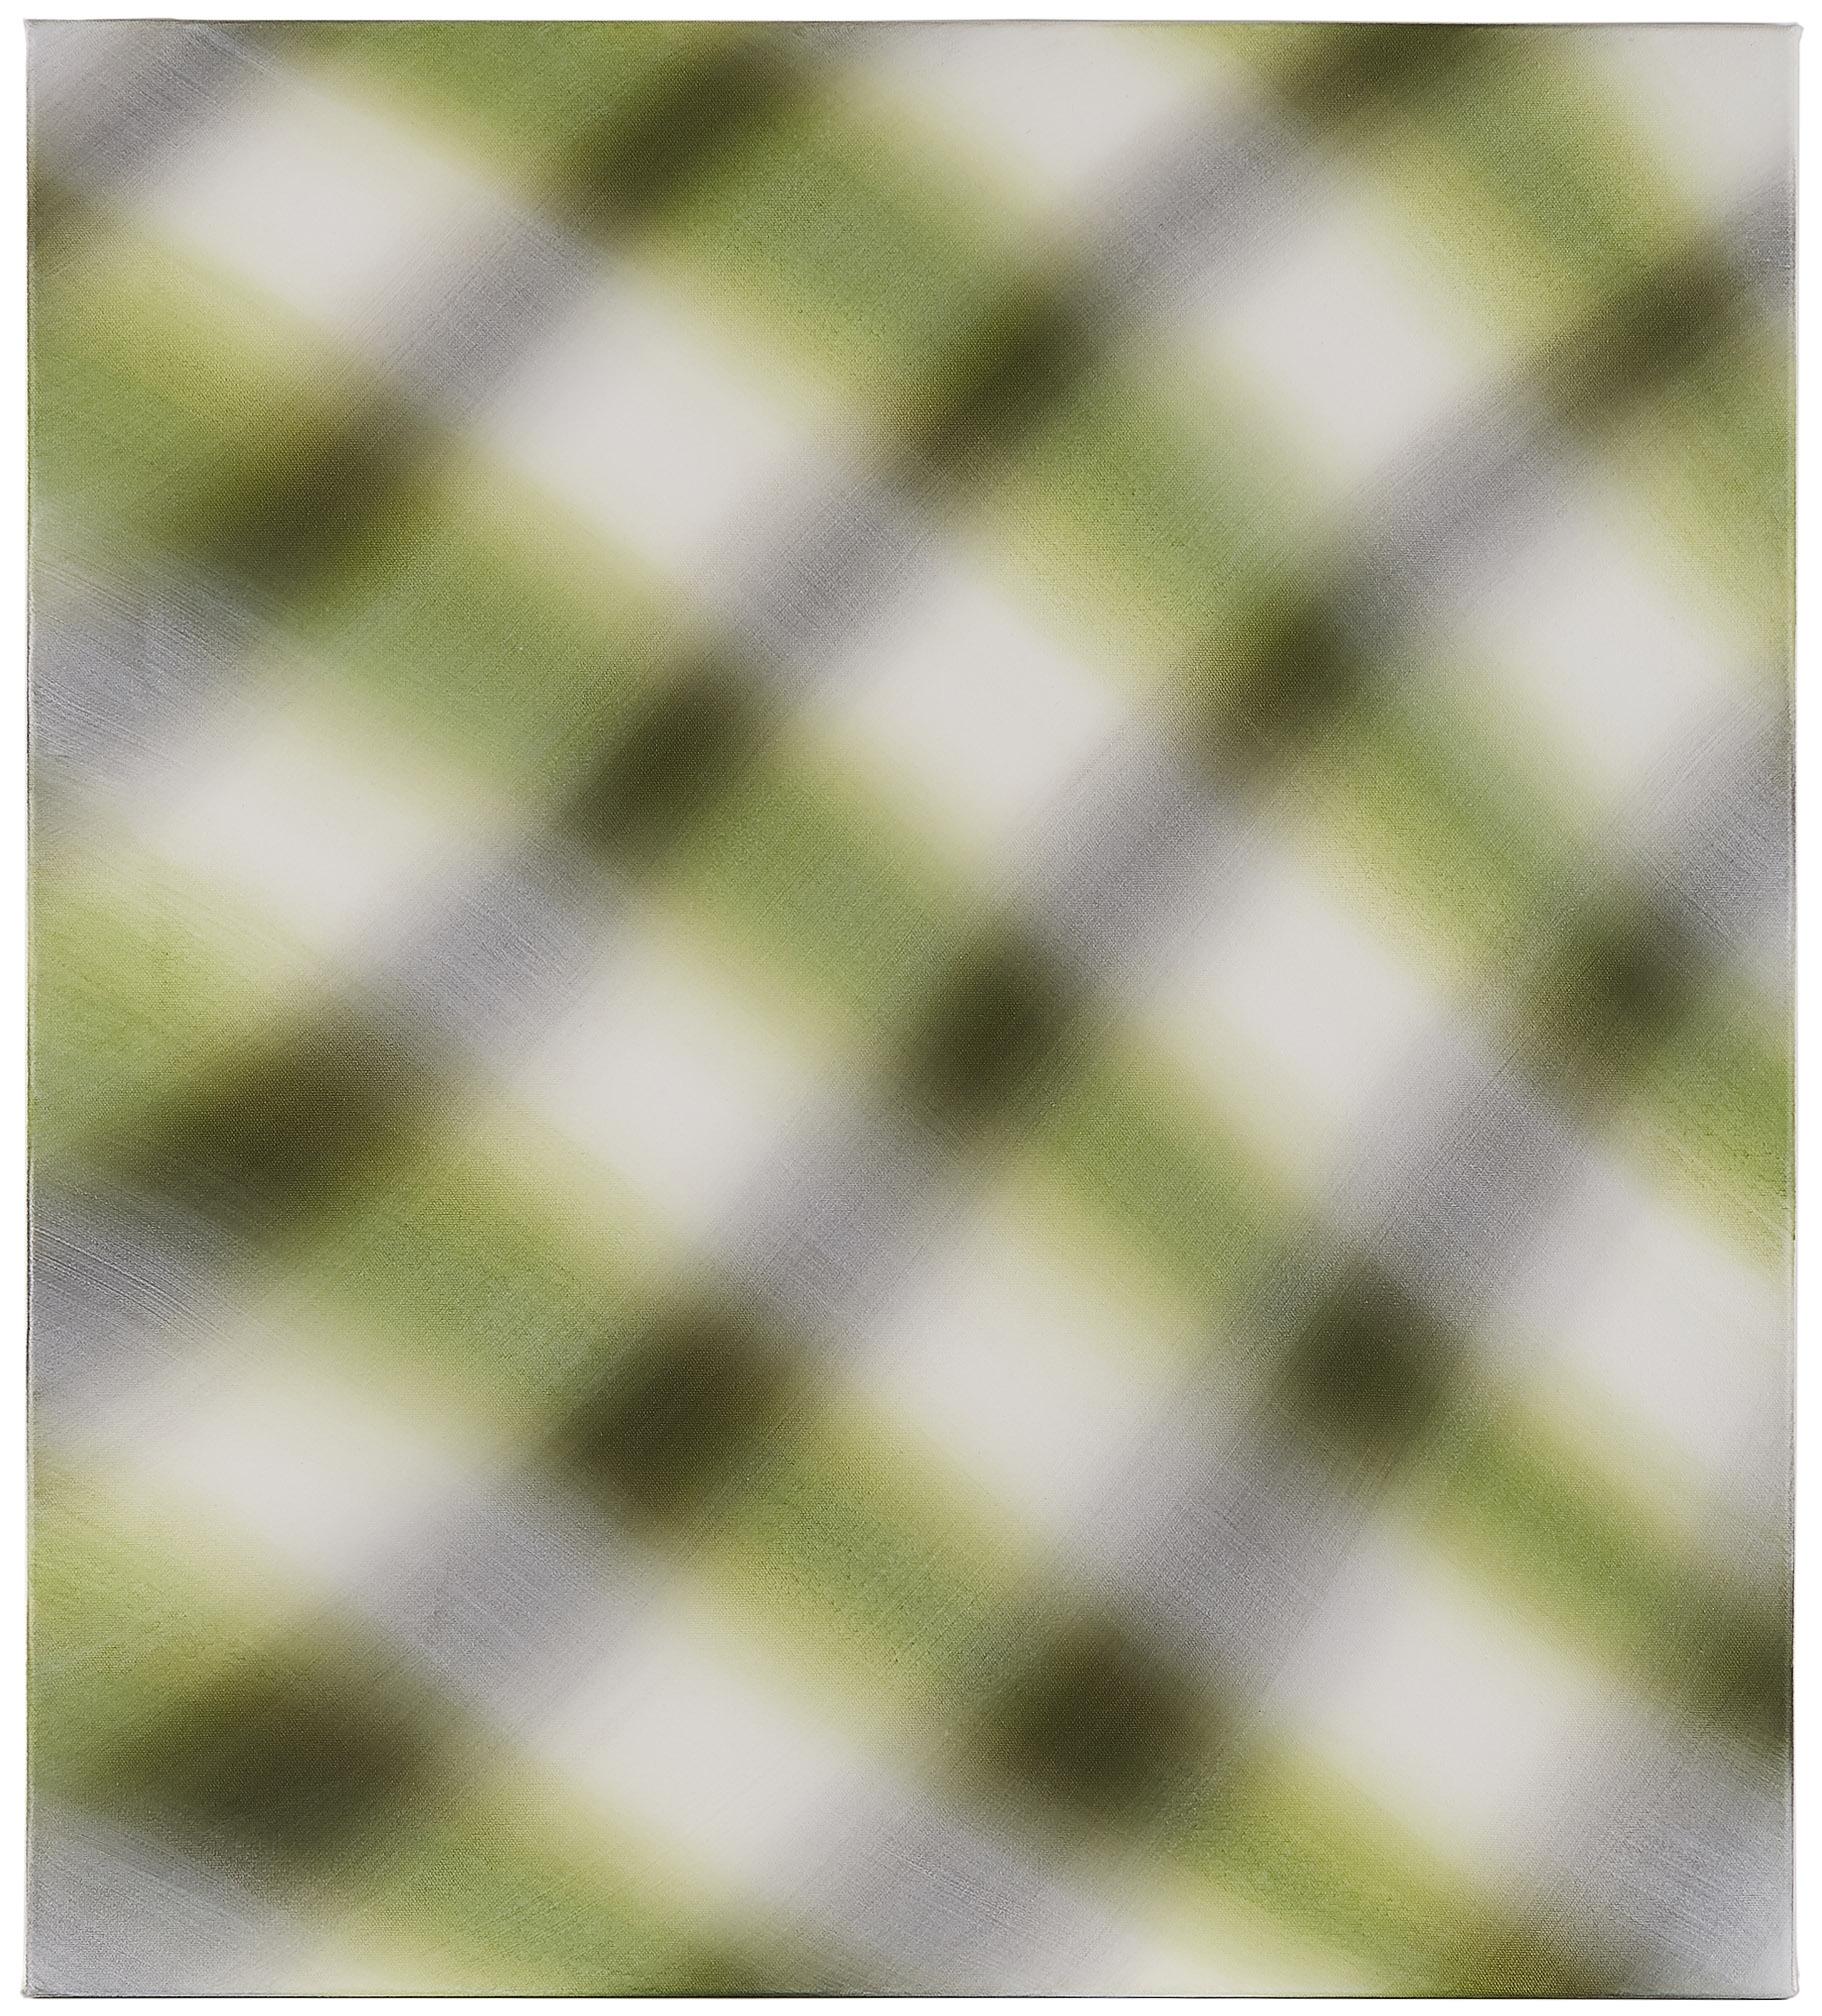 Gabriele Aulehla, ohne Titel, 2017, Acryl auf Leinwand, 40 x 50 cm